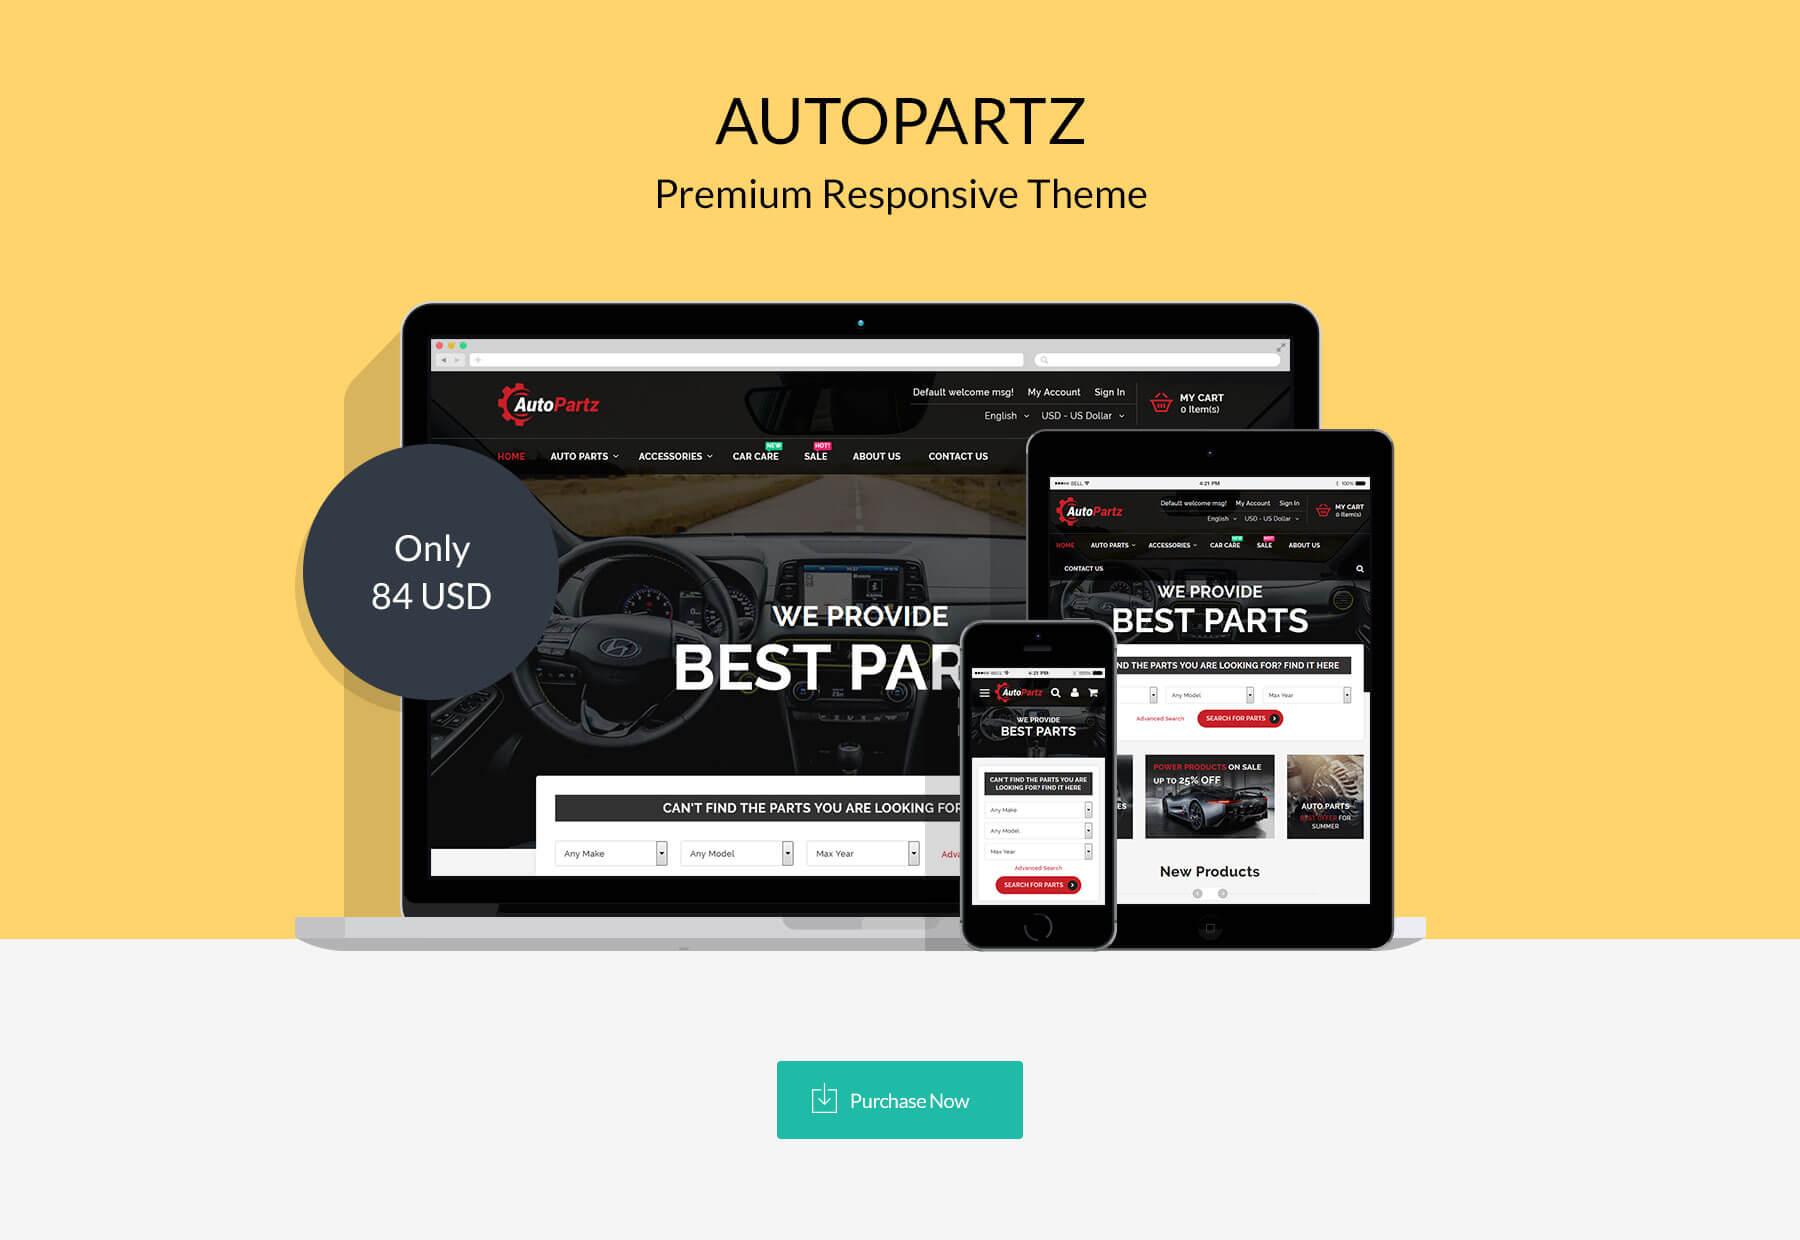 AutoPartz - Responsive Magento 2 Theme